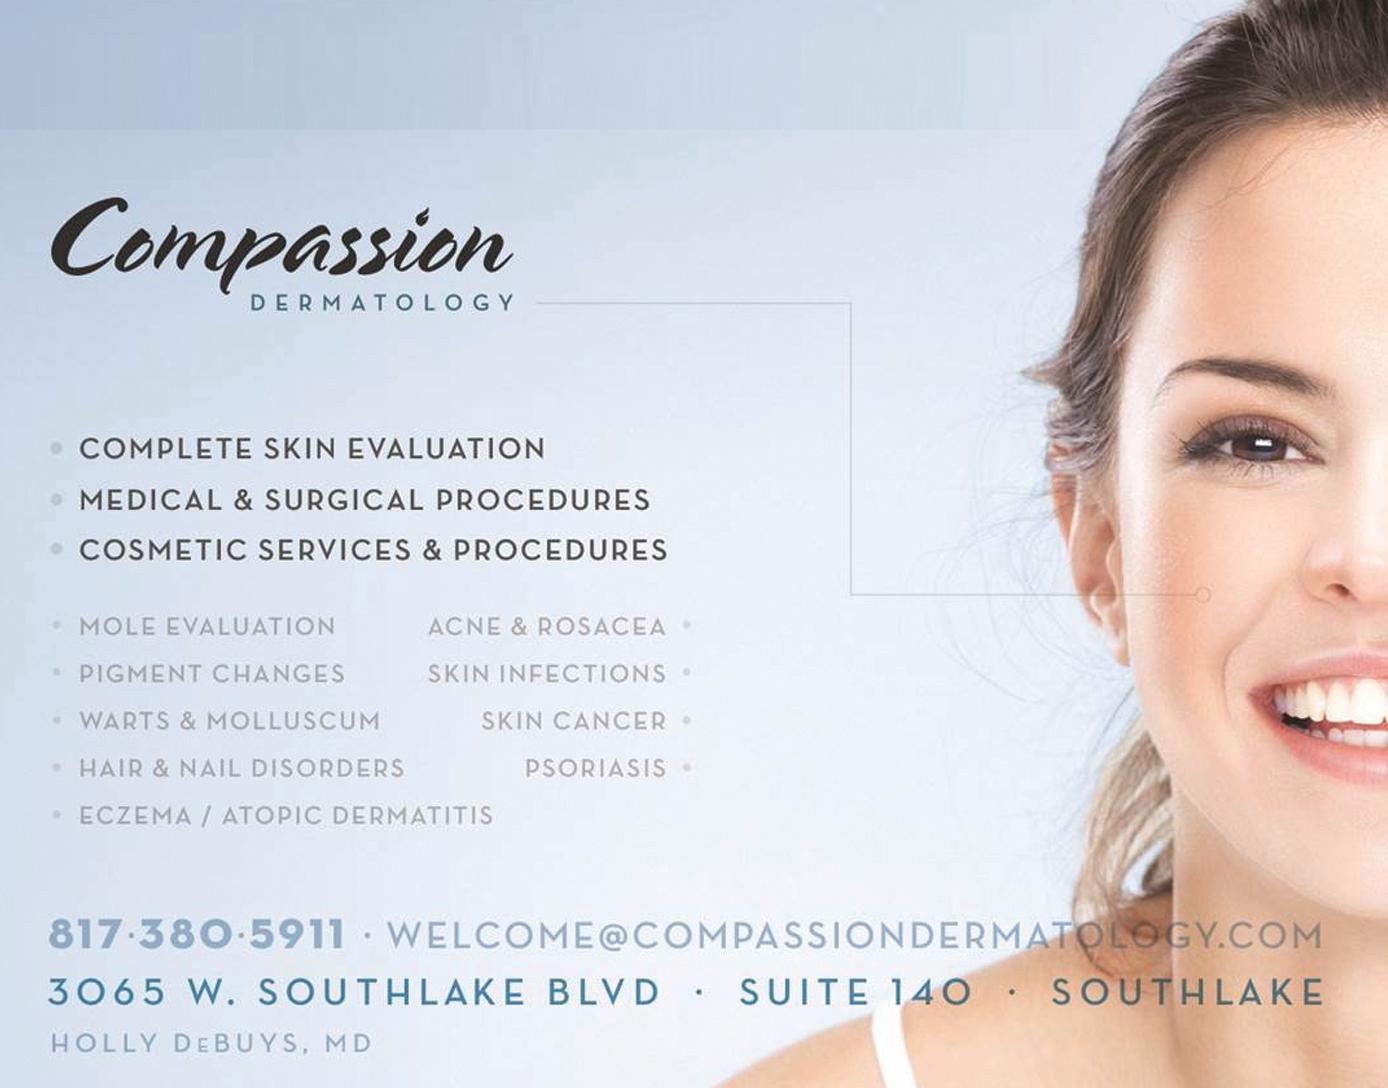 Compassion Dermatology